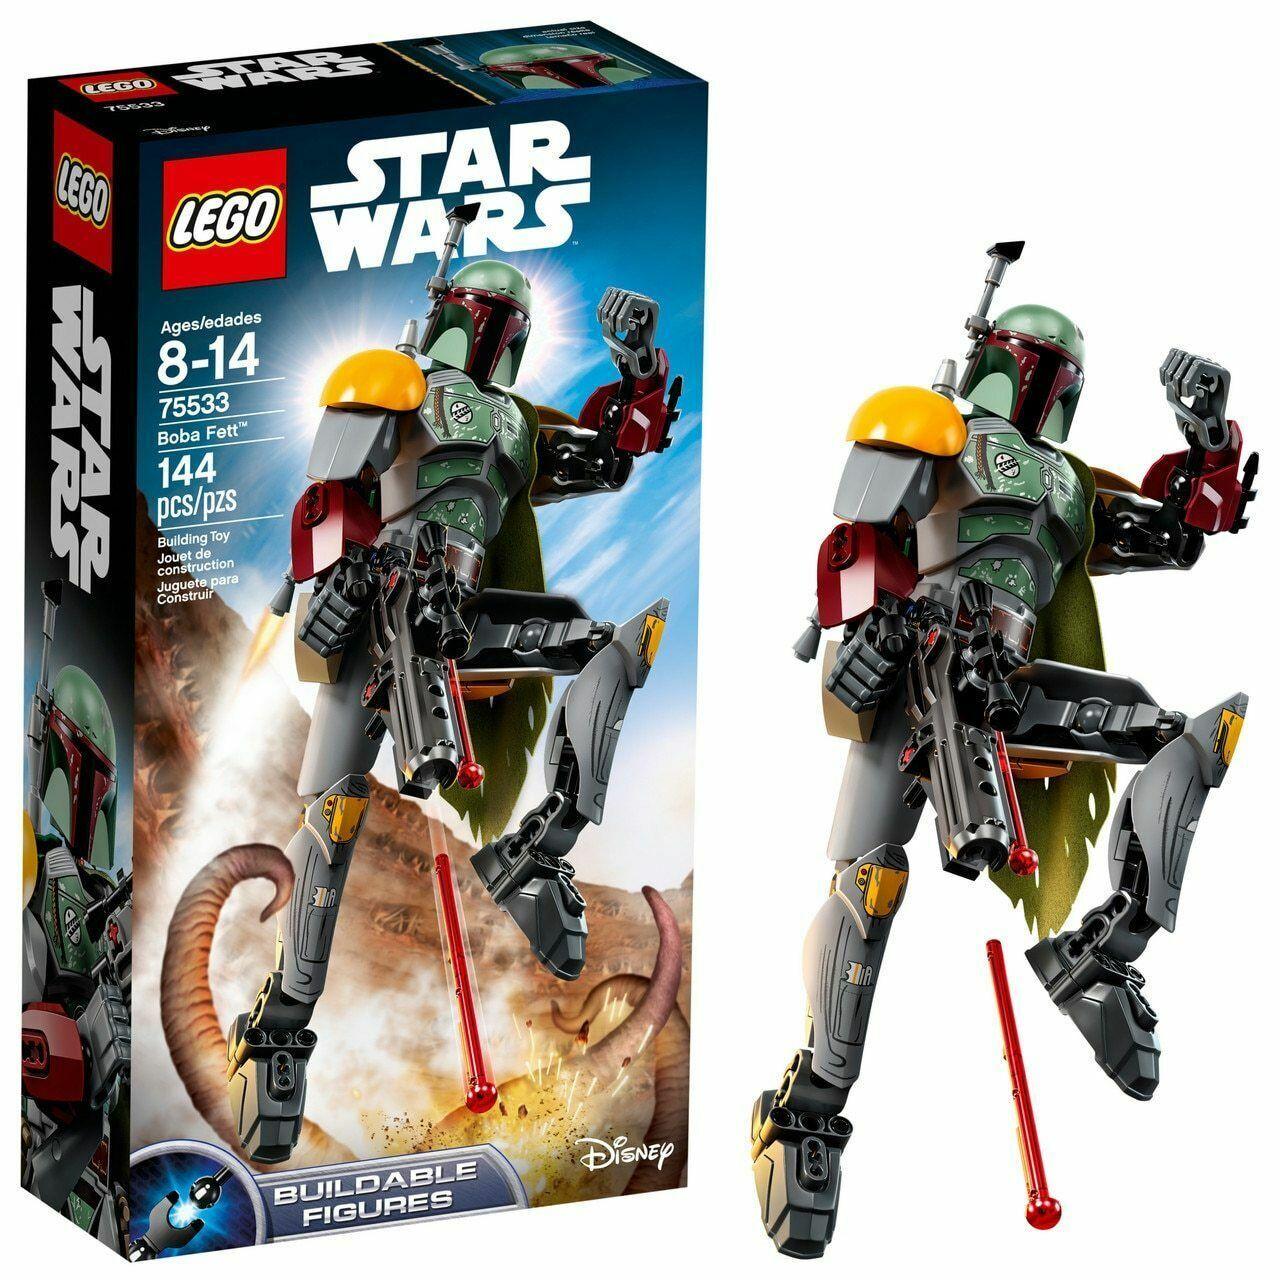 Lego estrella guerras 75533 Boba  Fett Buildable cifra 144pcs  da non perdere!